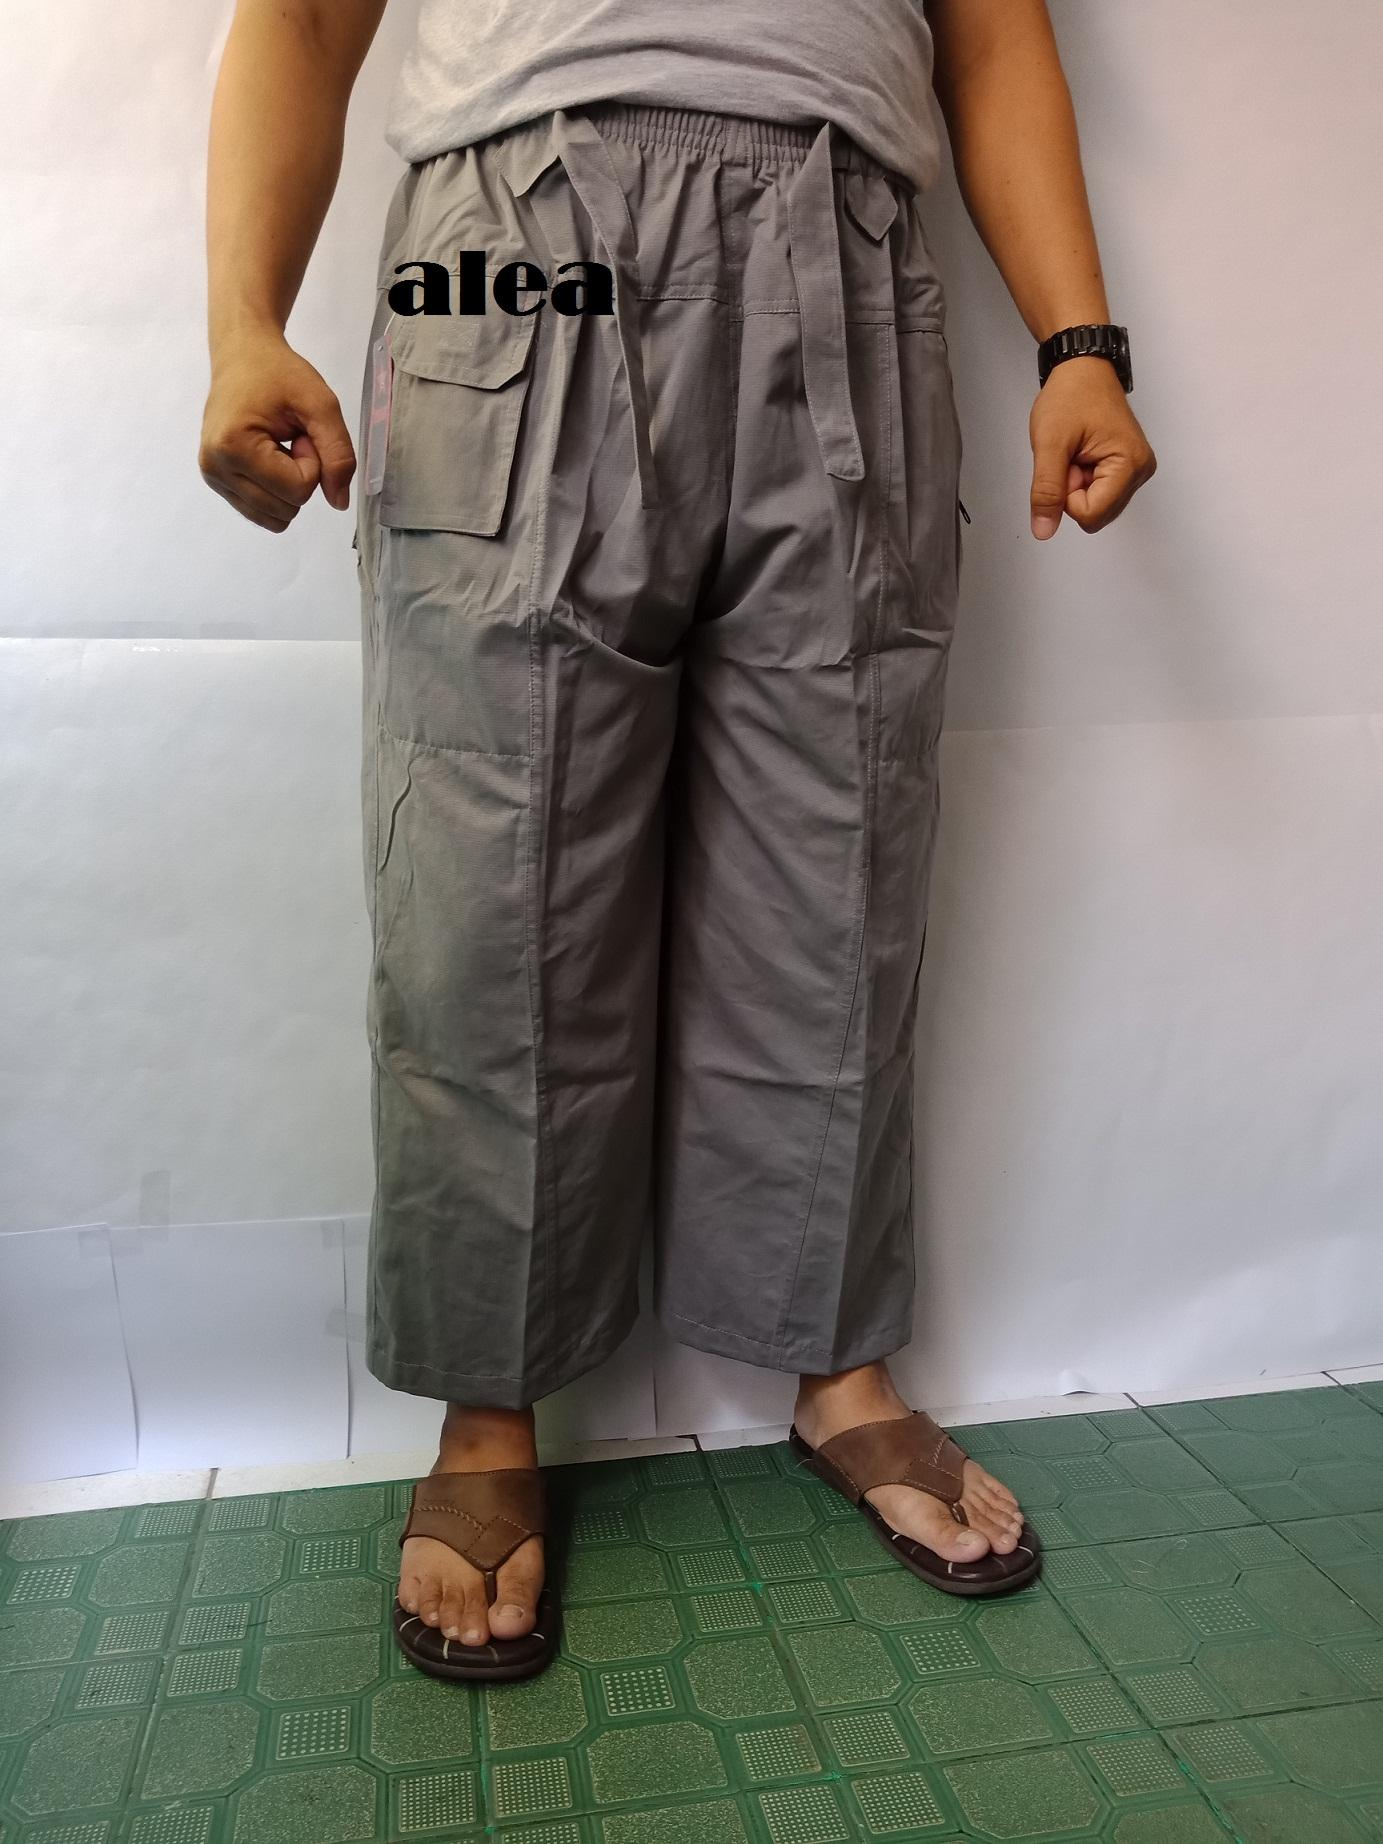 Harga Celana Pangsi Terbaru November 2018 Pakar Belanja Sirwal Boxer Jumbo Xxxl Polos Xxl Abu